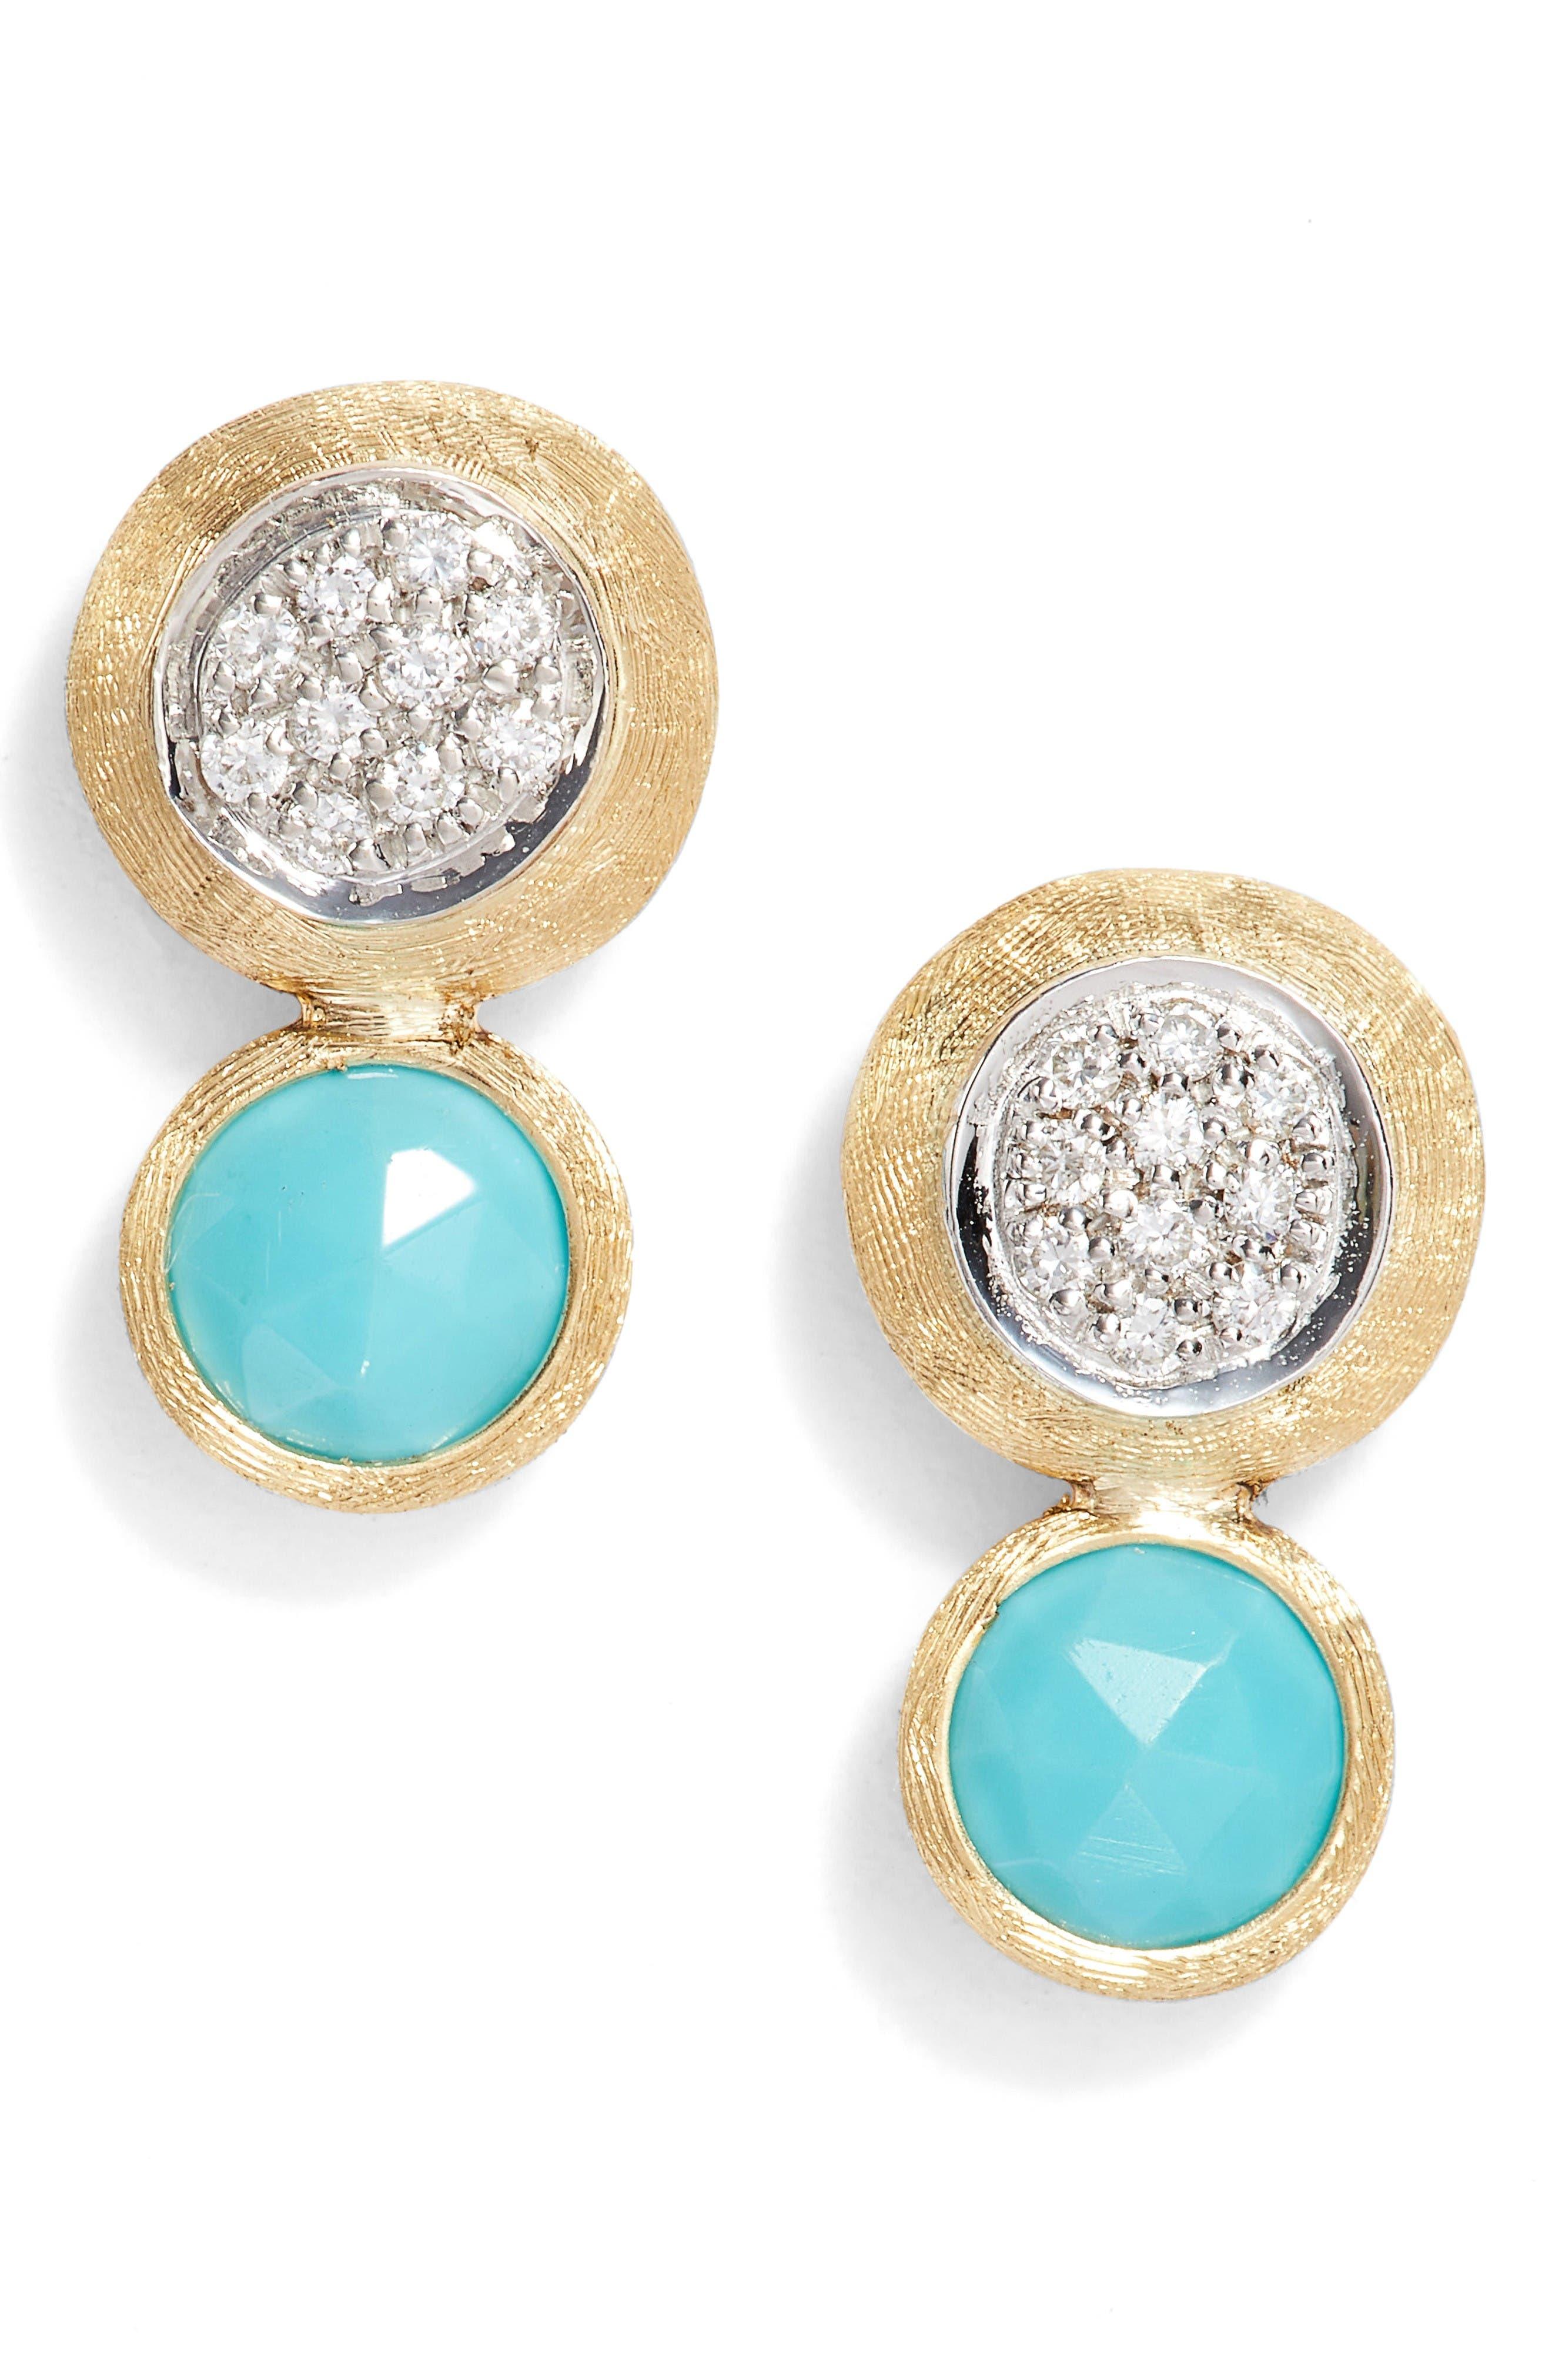 Main Image - Marco Bicego Jaipur Diamond & Turquoise Stud Earrings